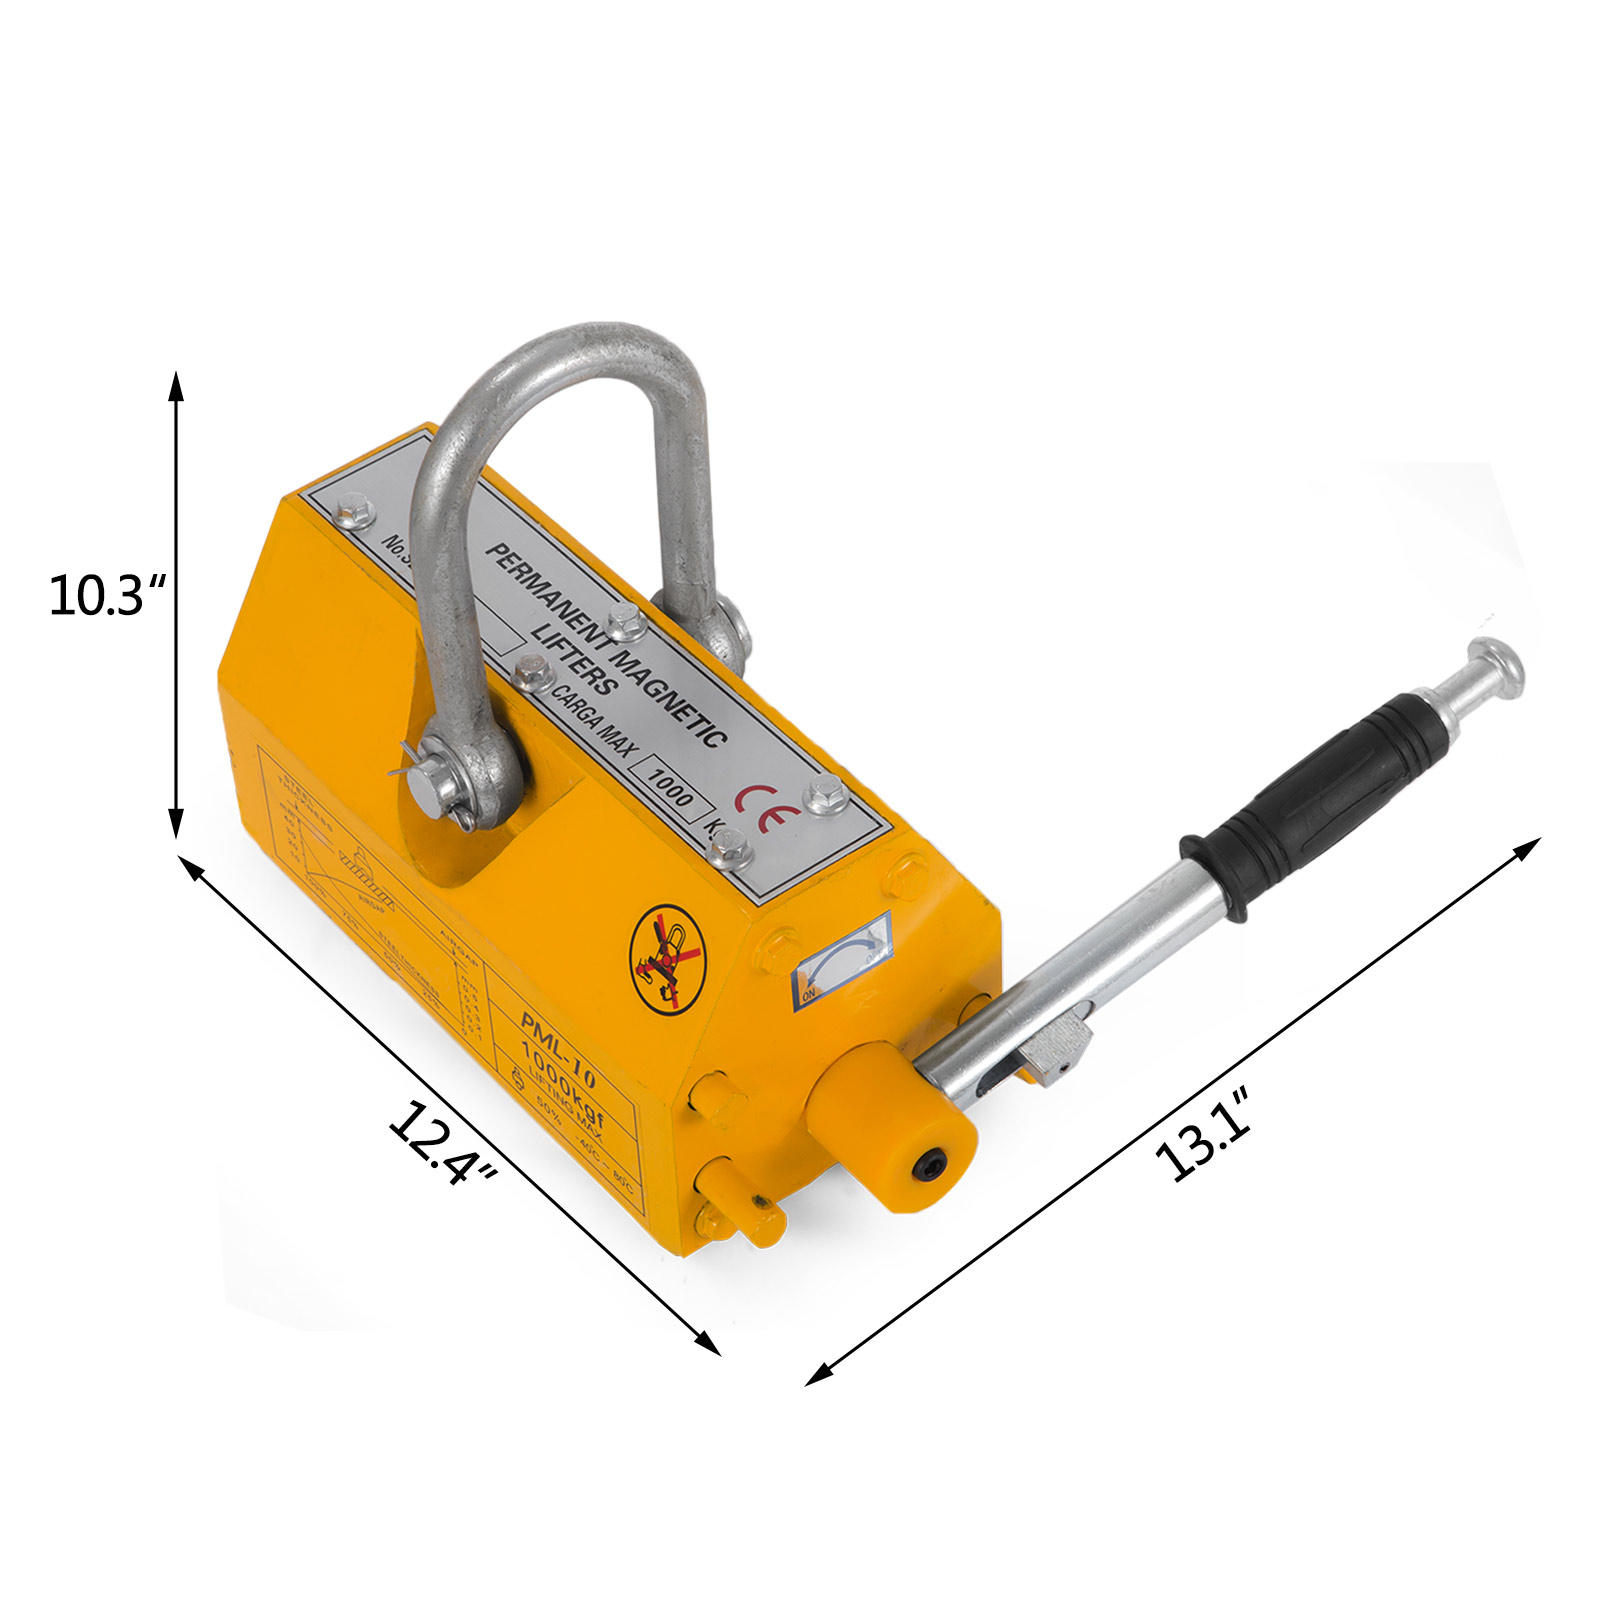 100-300-600-1000KG-Steel-Magnetic-Lifter-Heavy-Duty-Crane-Hoist-Lifting-Magnet miniature 62